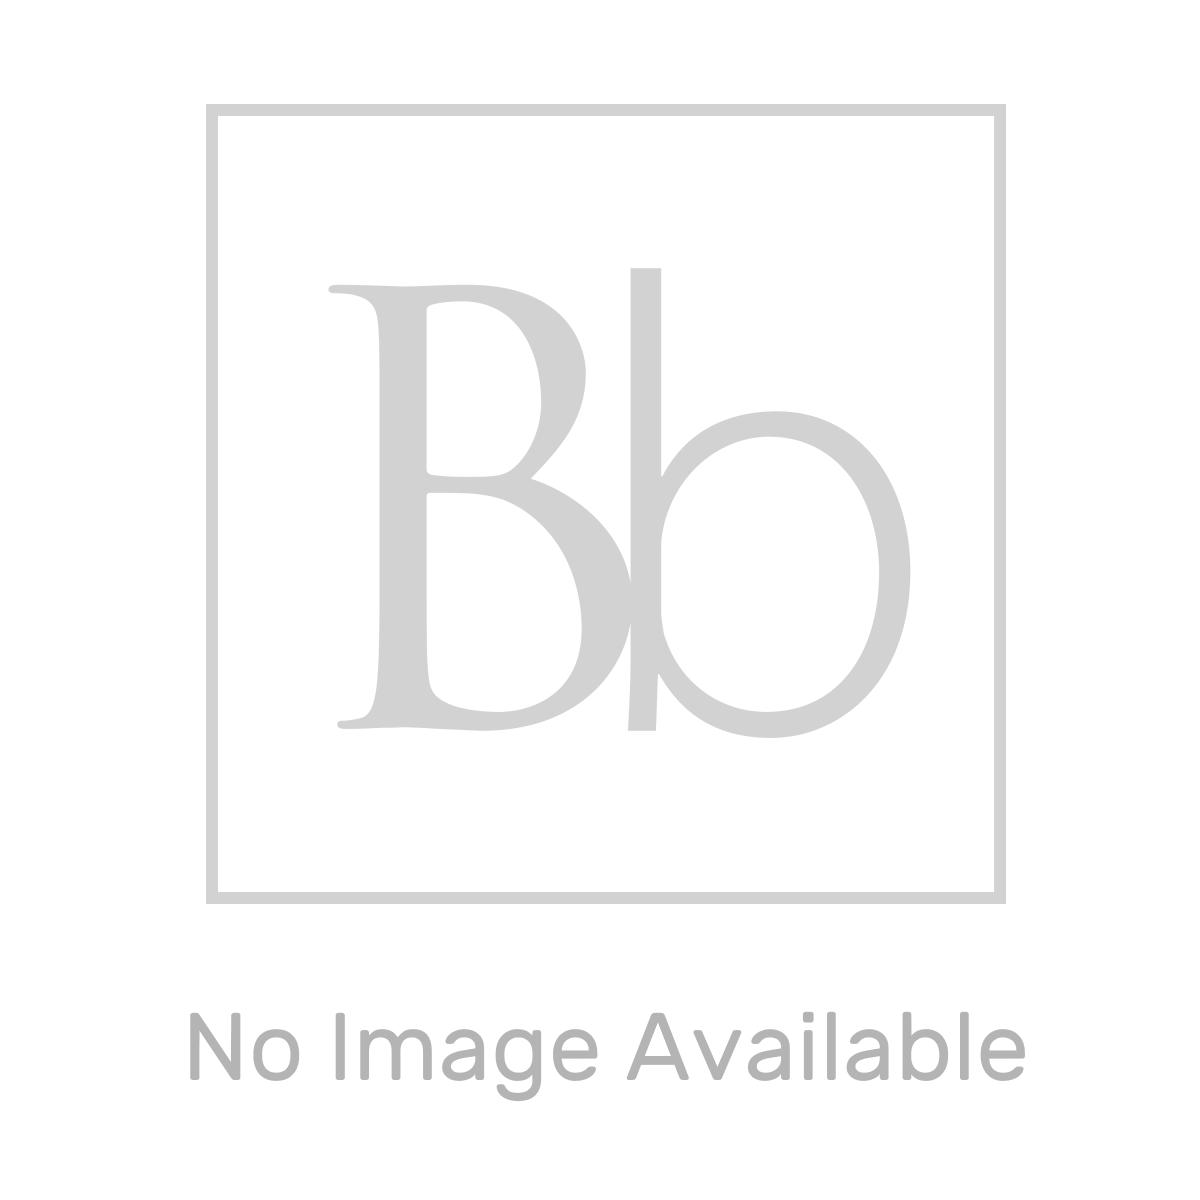 Kartell K-vit White Tetris L Shaped Left Hand Bath with Leg Sets 1700mm